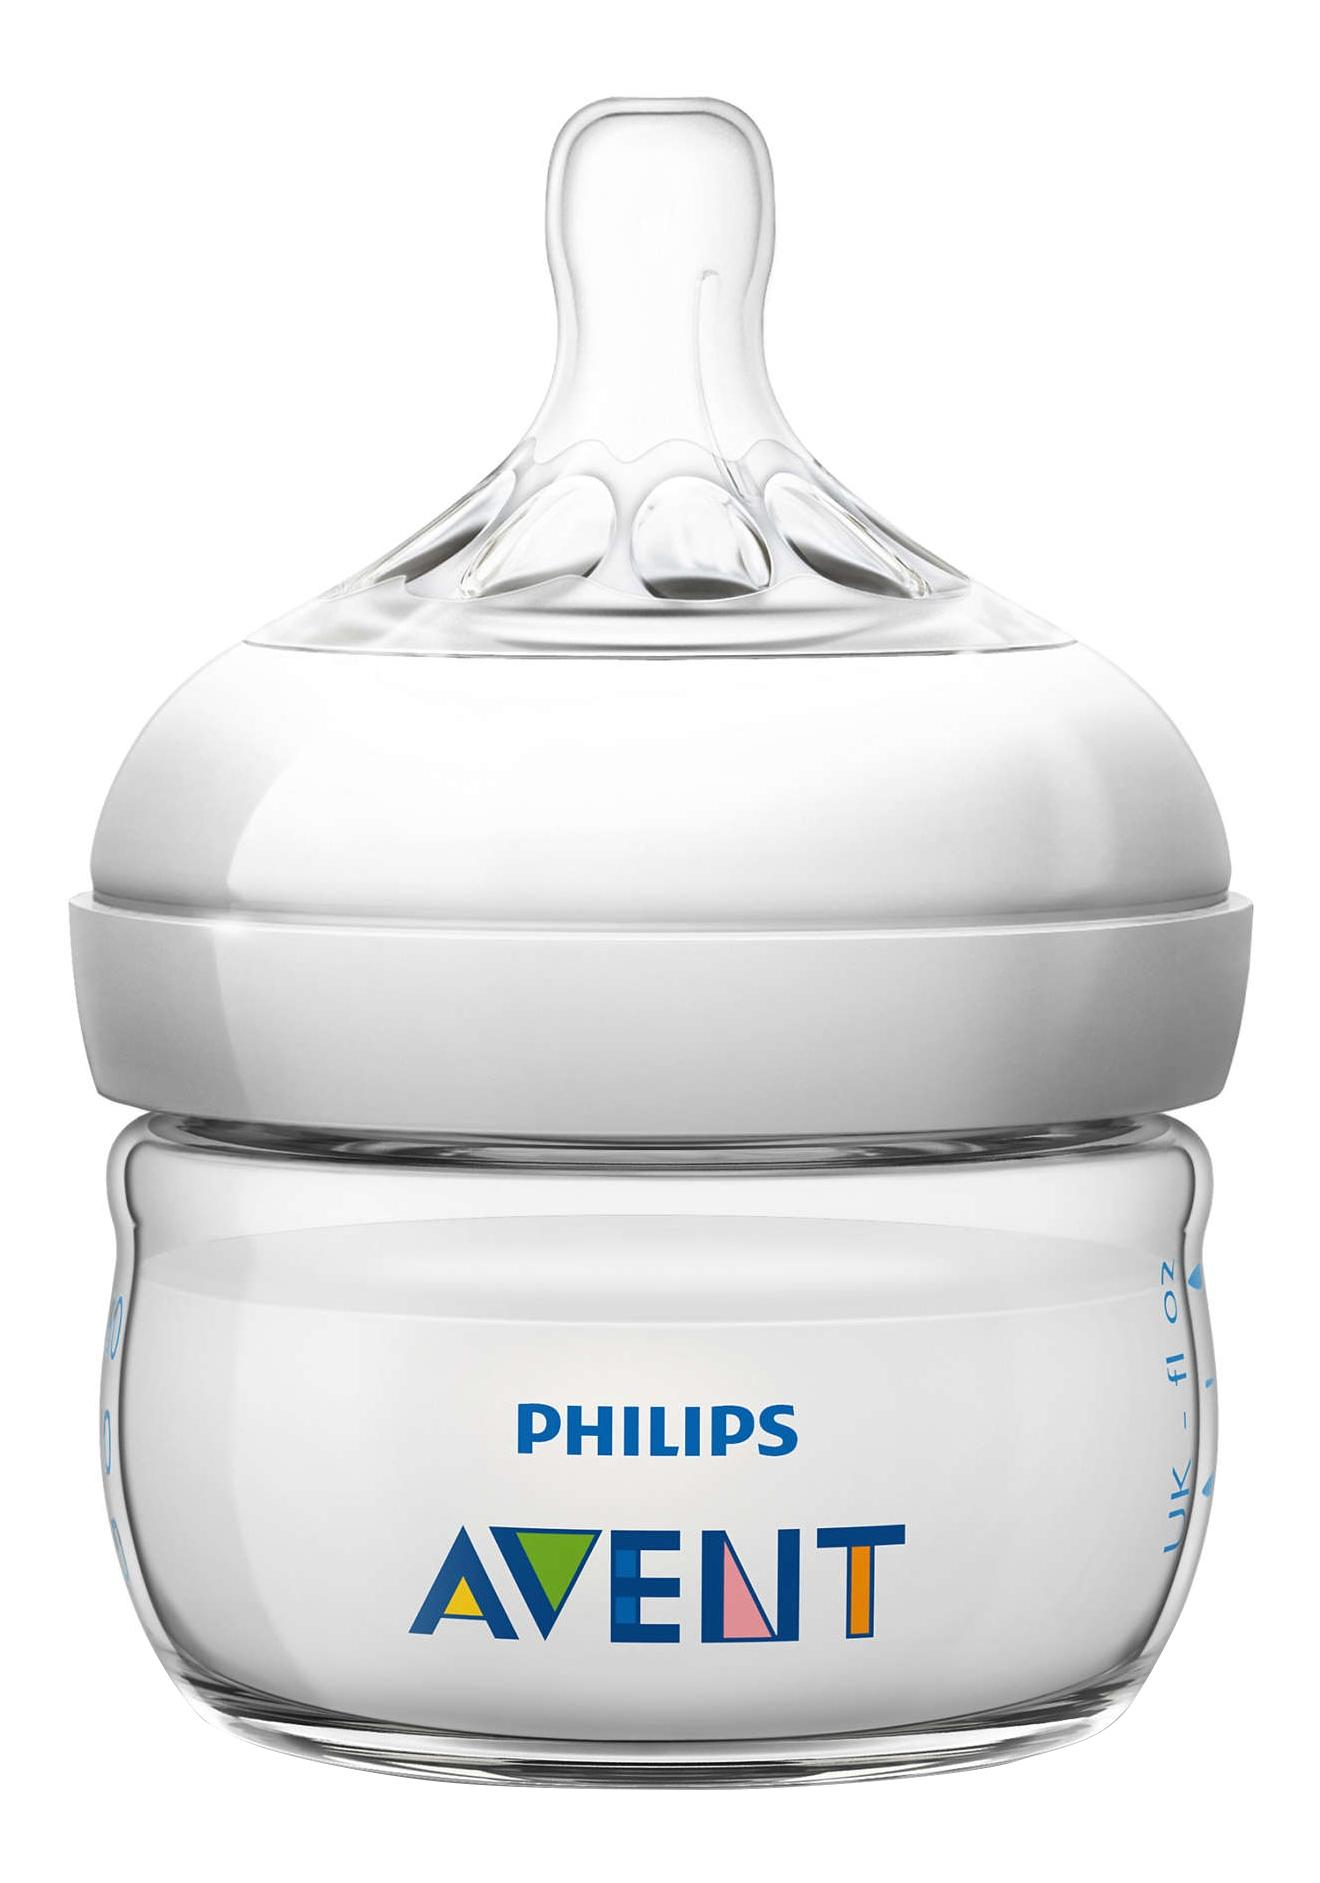 Детская бутылочка Philips Avent Natural SCF699/17, 60 мл, 1 шт., 0 мес.+